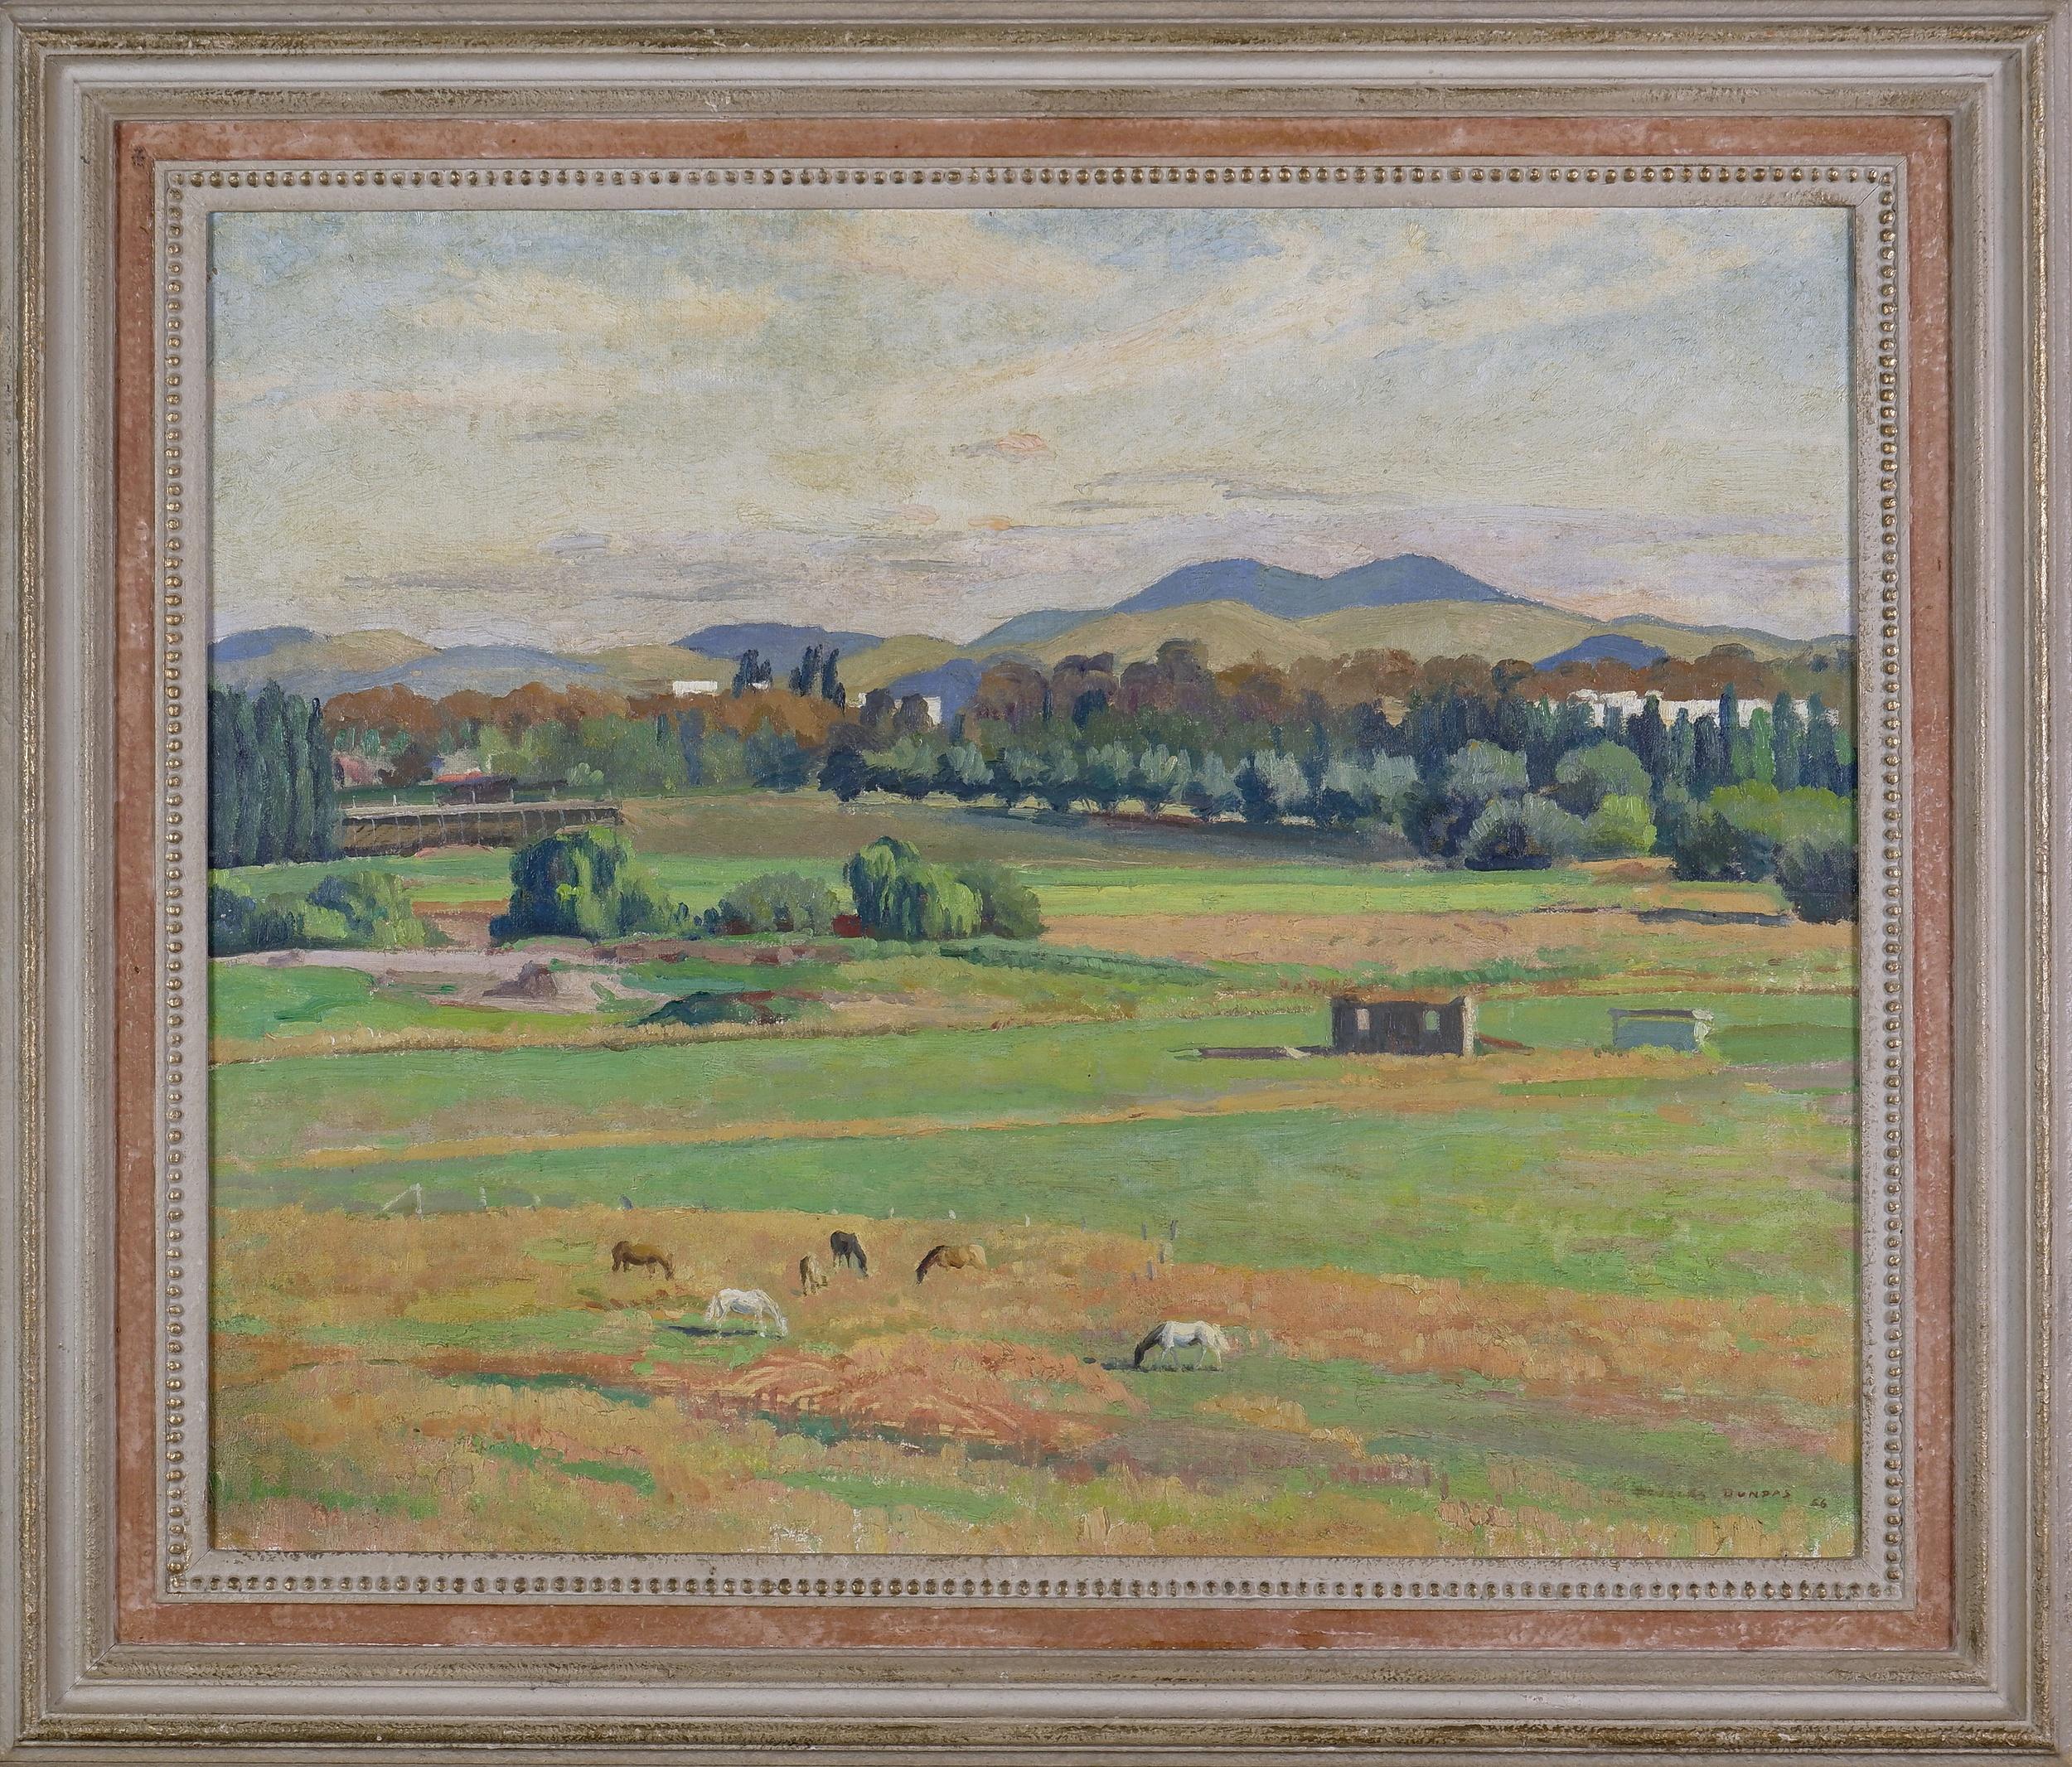 'Douglas Dundas (1900-1981), Untitled (Canberra Landscape) 1956, Oil on Canvas'